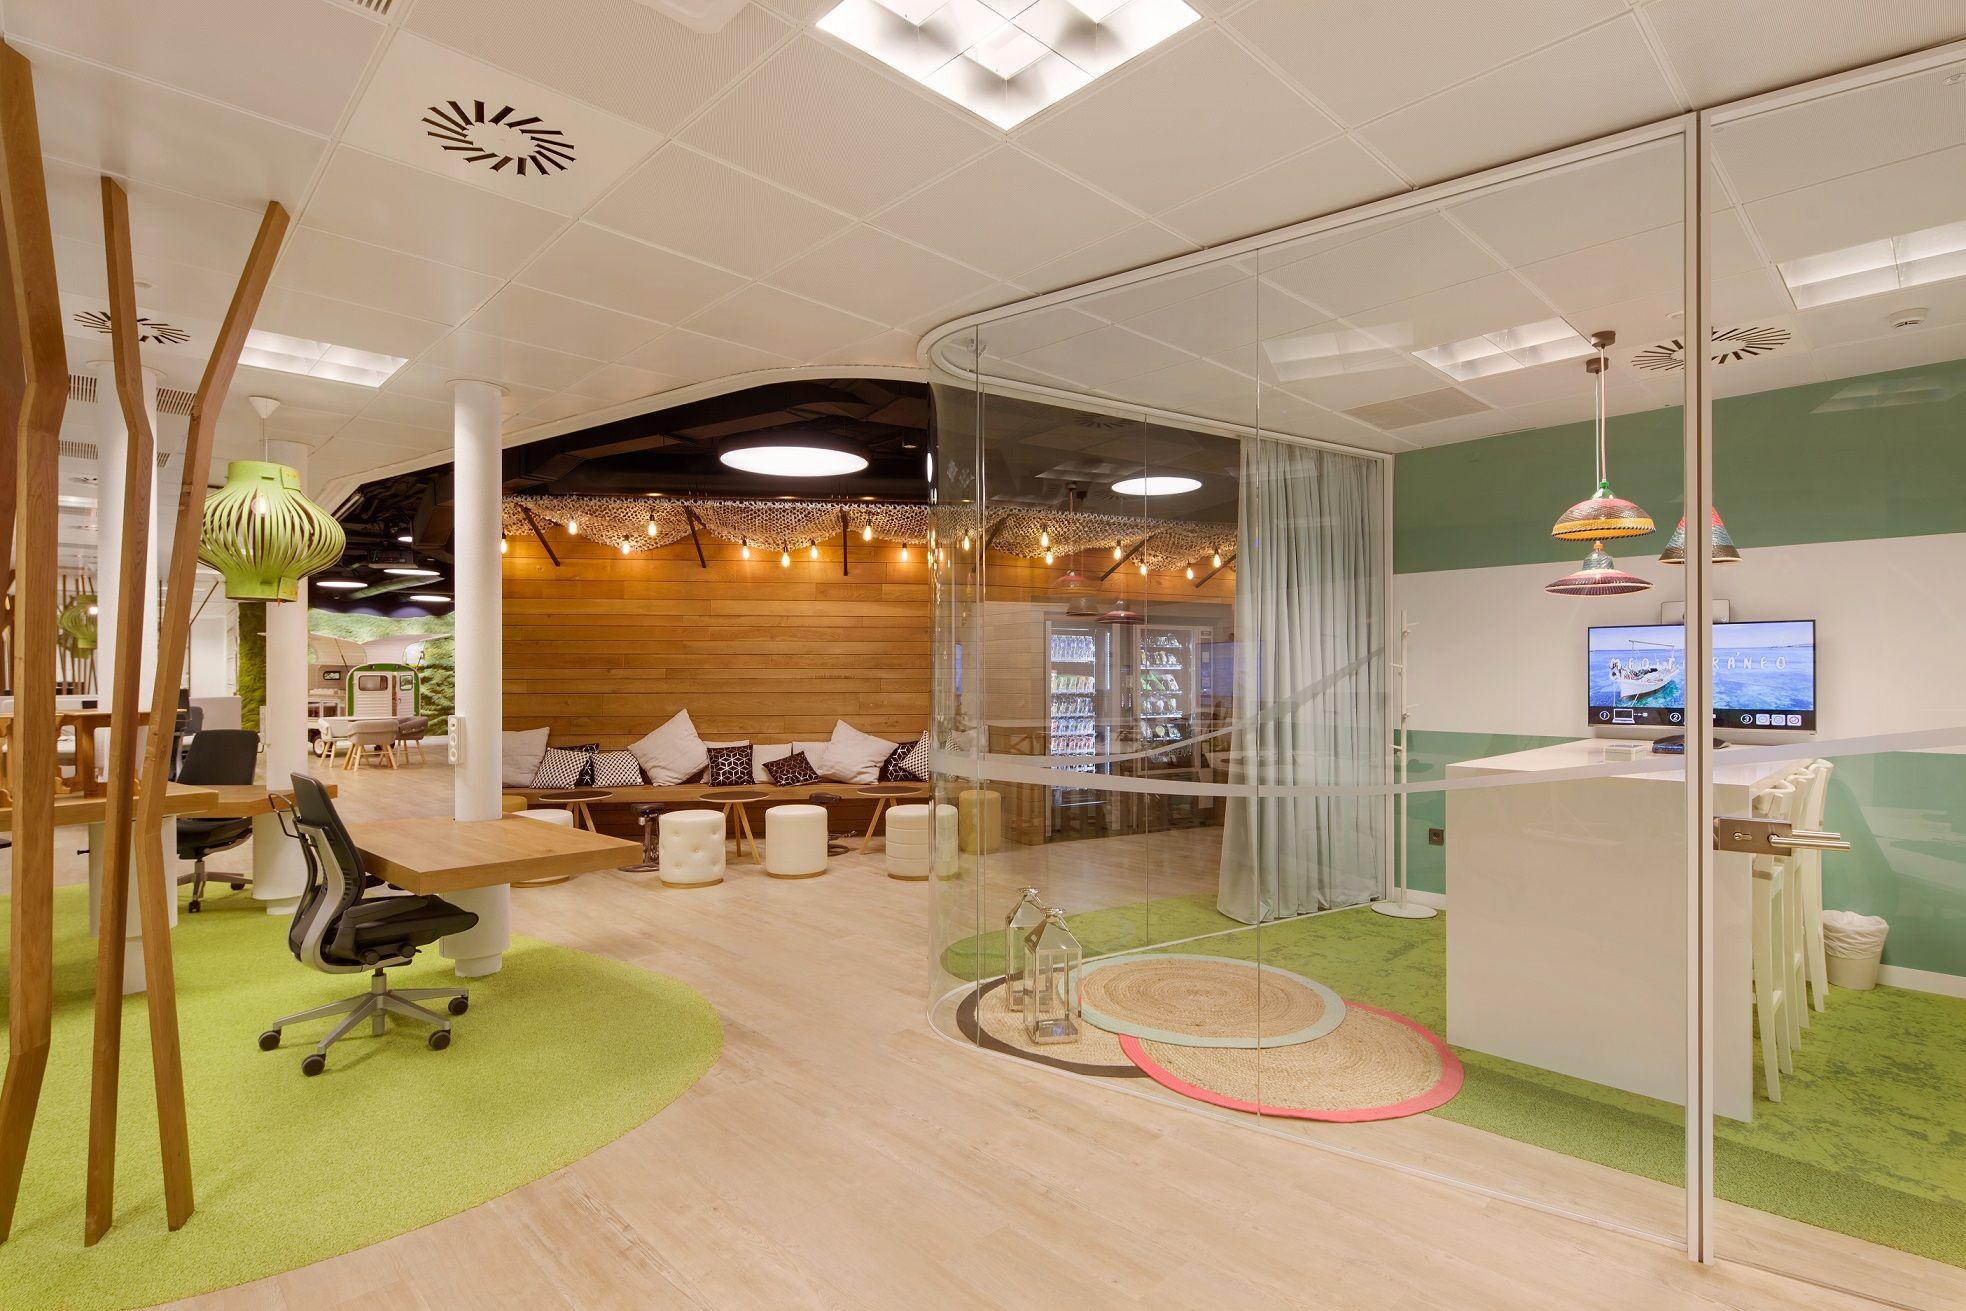 Launge corner de las oficinas de cbre espa a interface for Oficinas de air europa en madrid